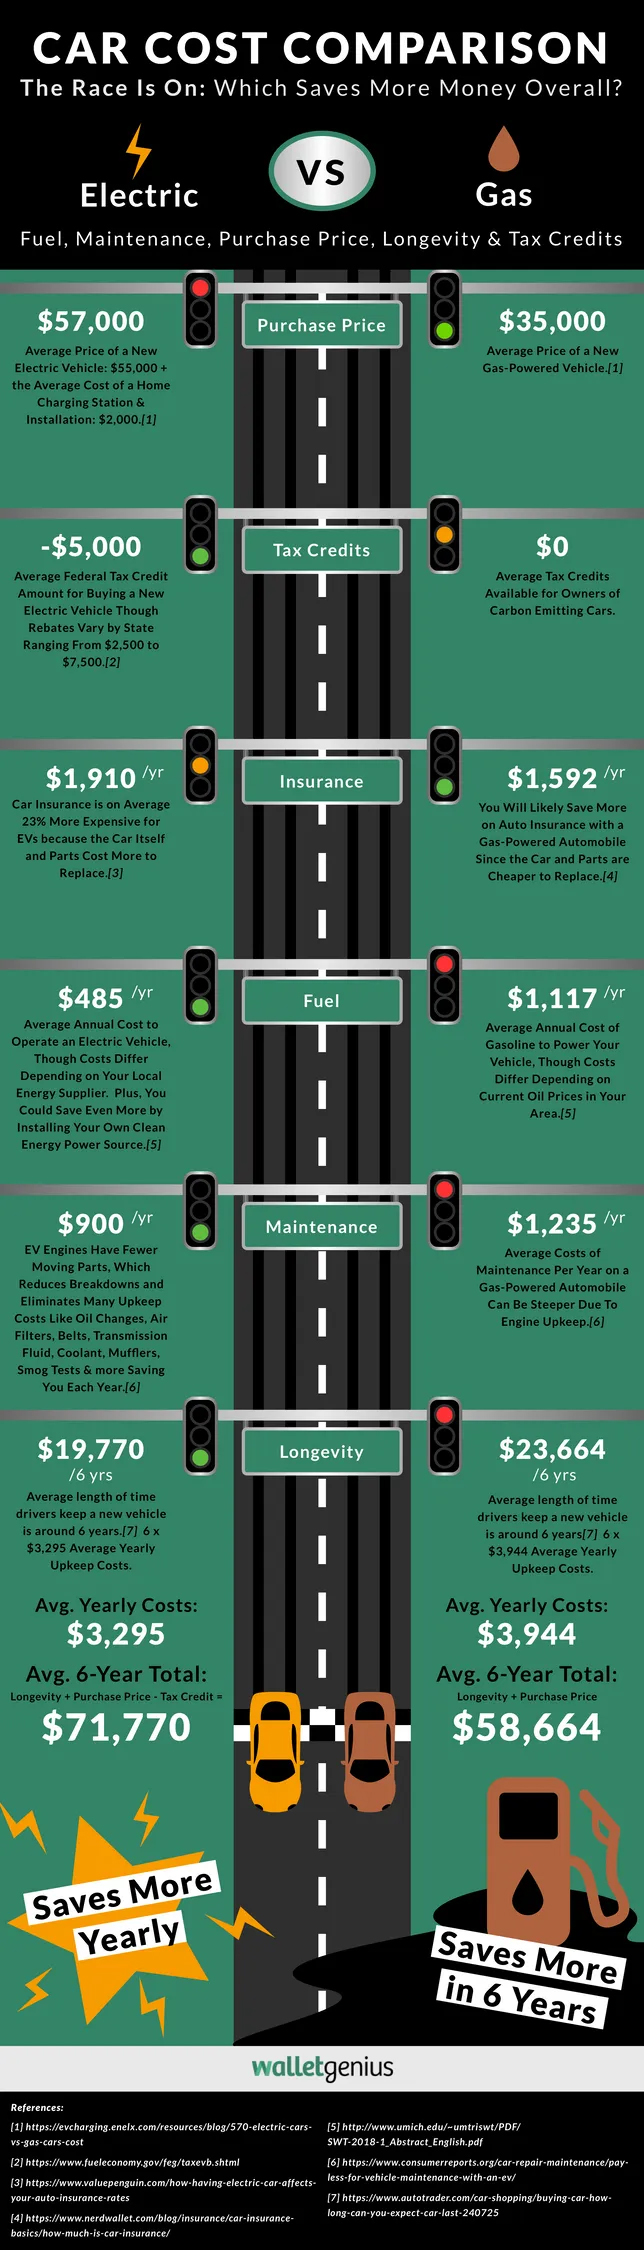 Car Cost Comparison: Electric Cars vs Gas Cars